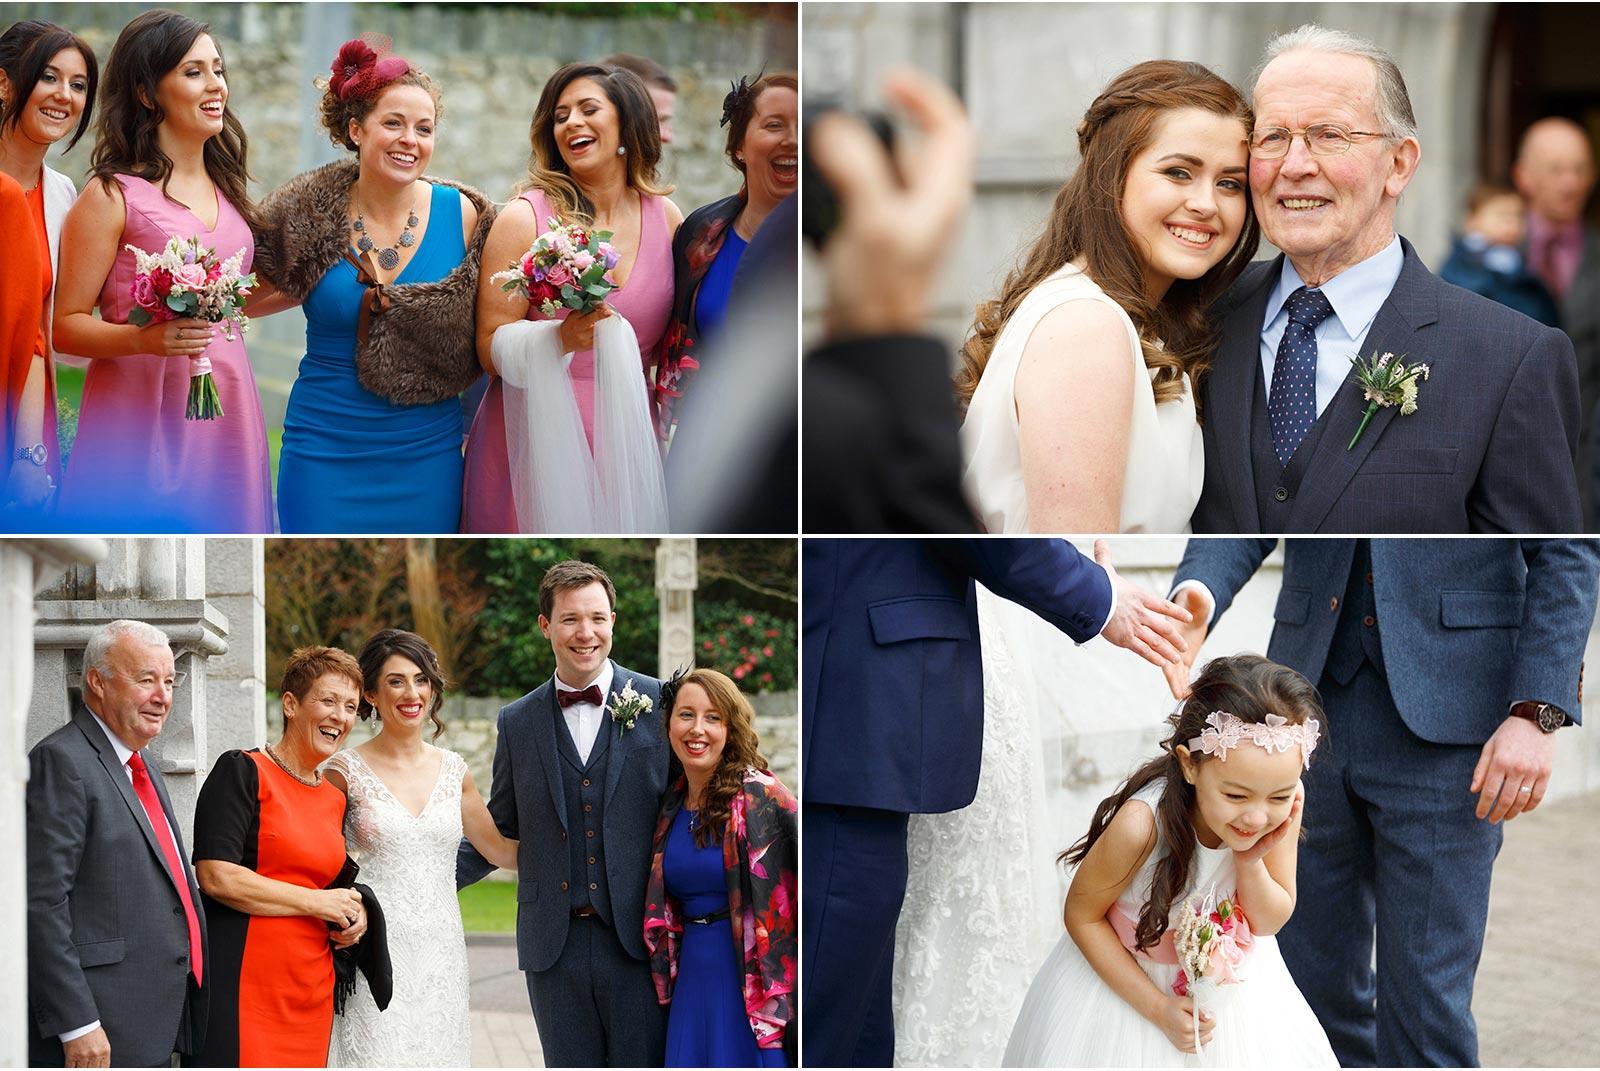 wedding guests at church wedding